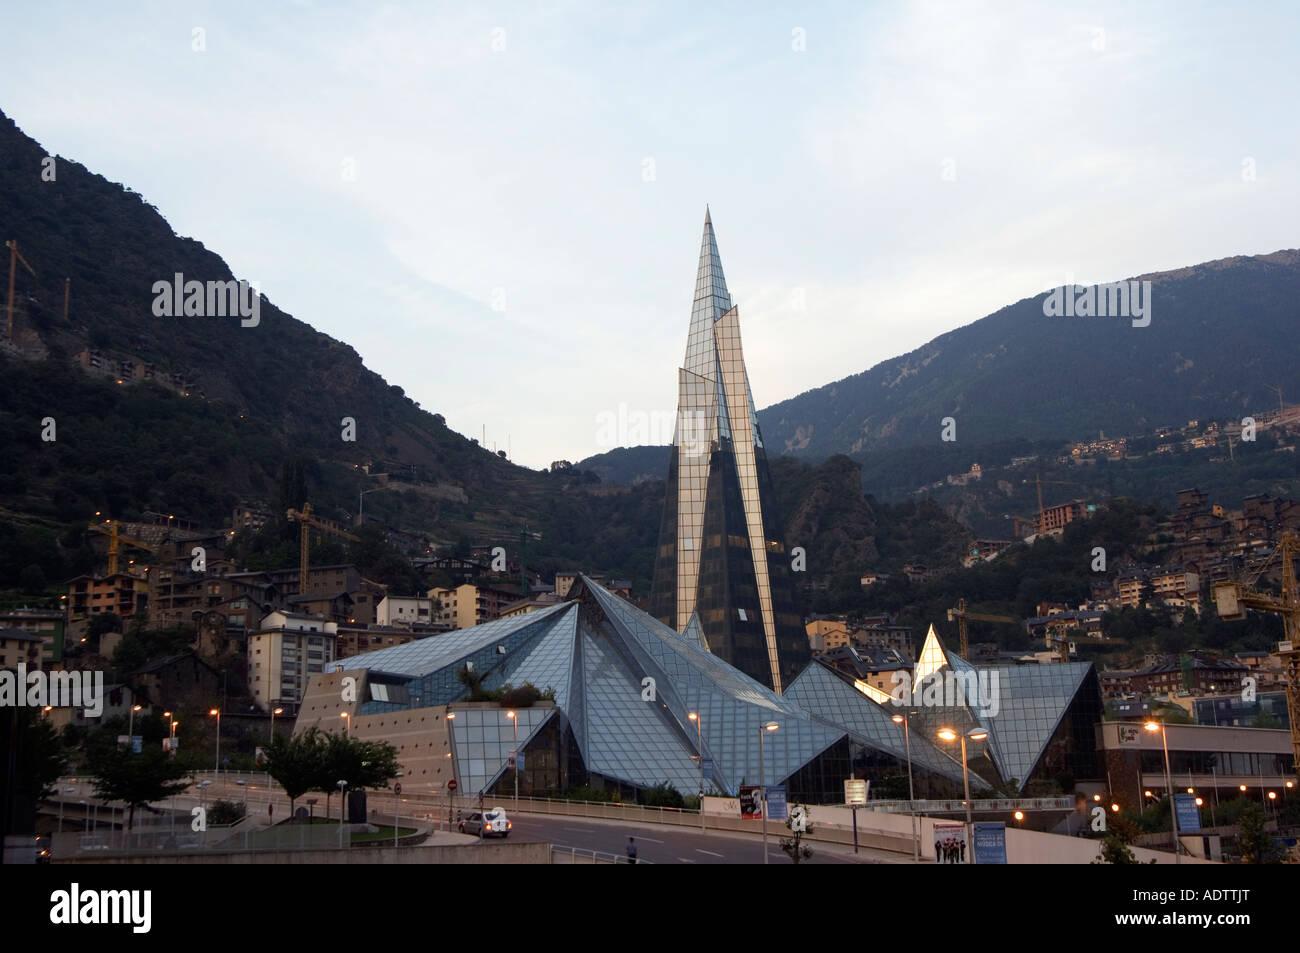 Andorra Andorra La Vella Hot Spring Complex Caldea lit up in the evening Stock Photo